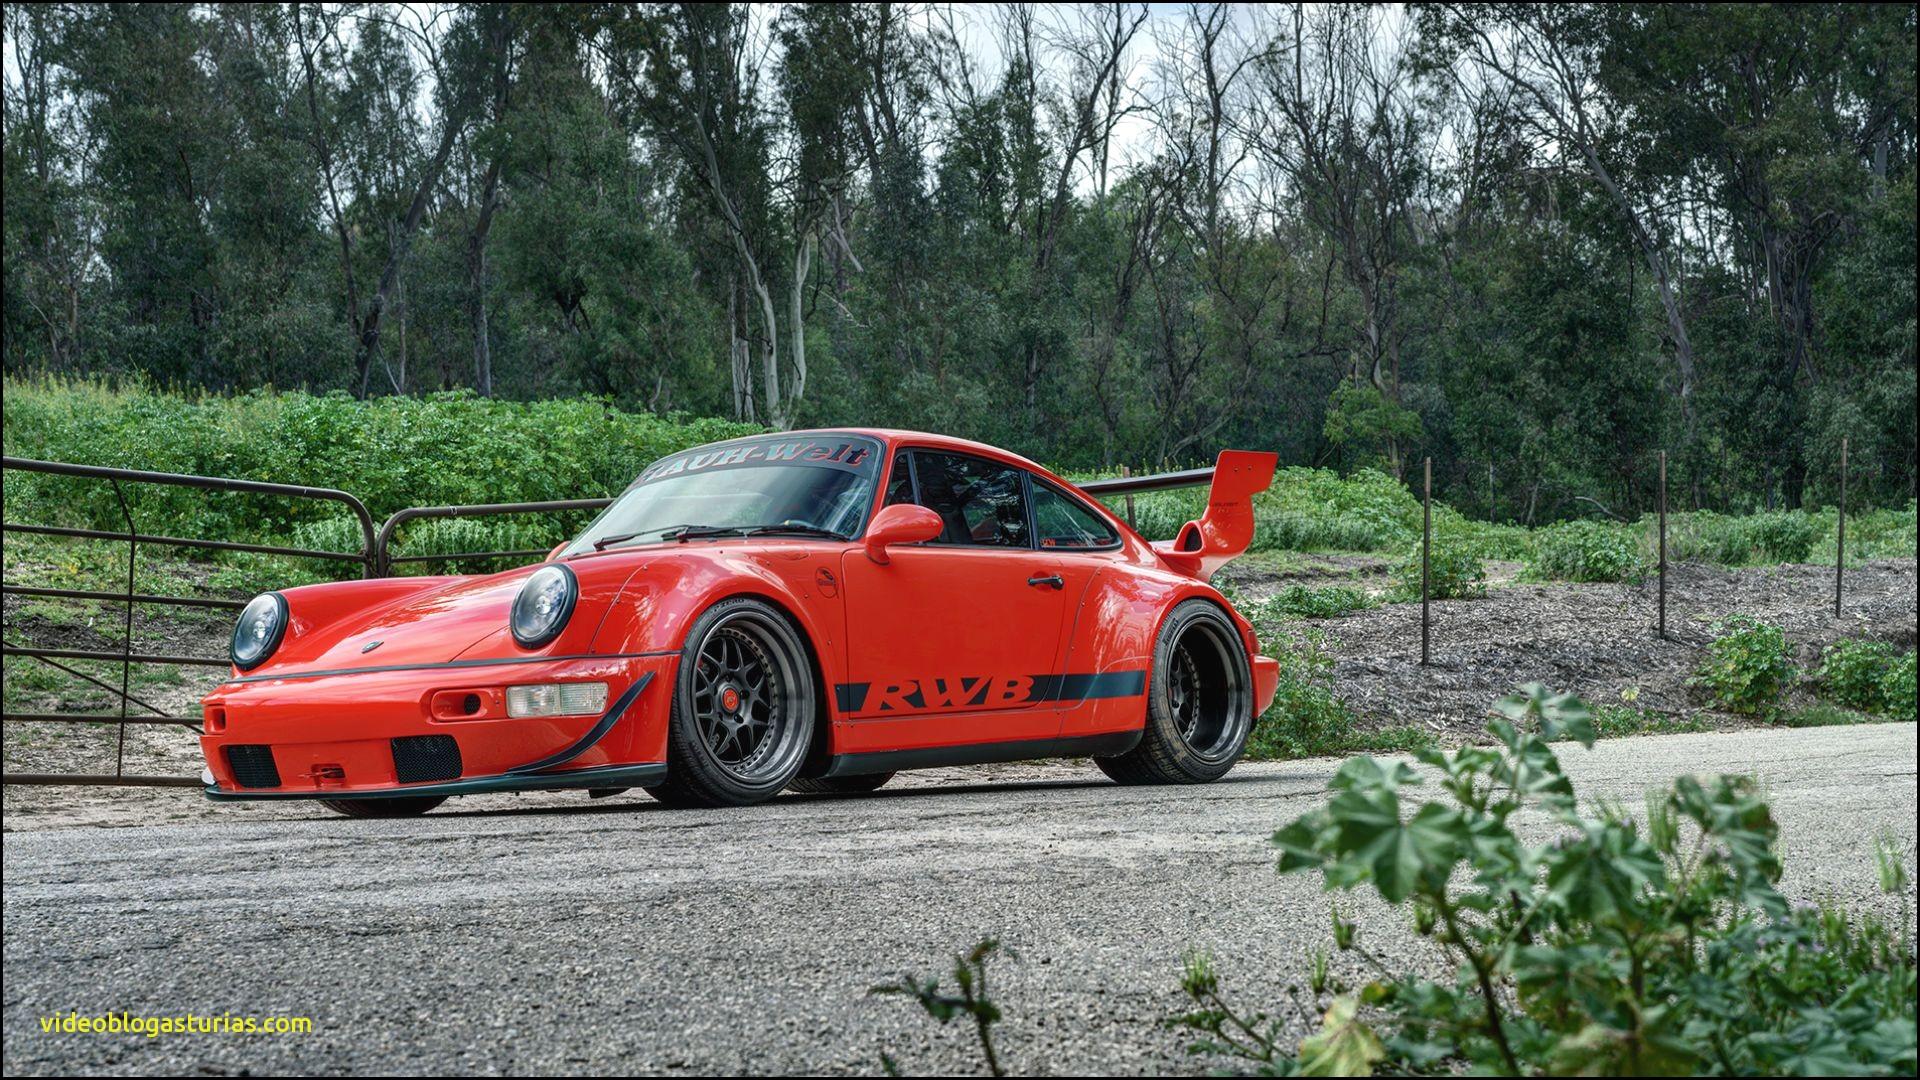 Rwb Body Kits 17 Inspirational Rwb Porsche 911 Sema 964